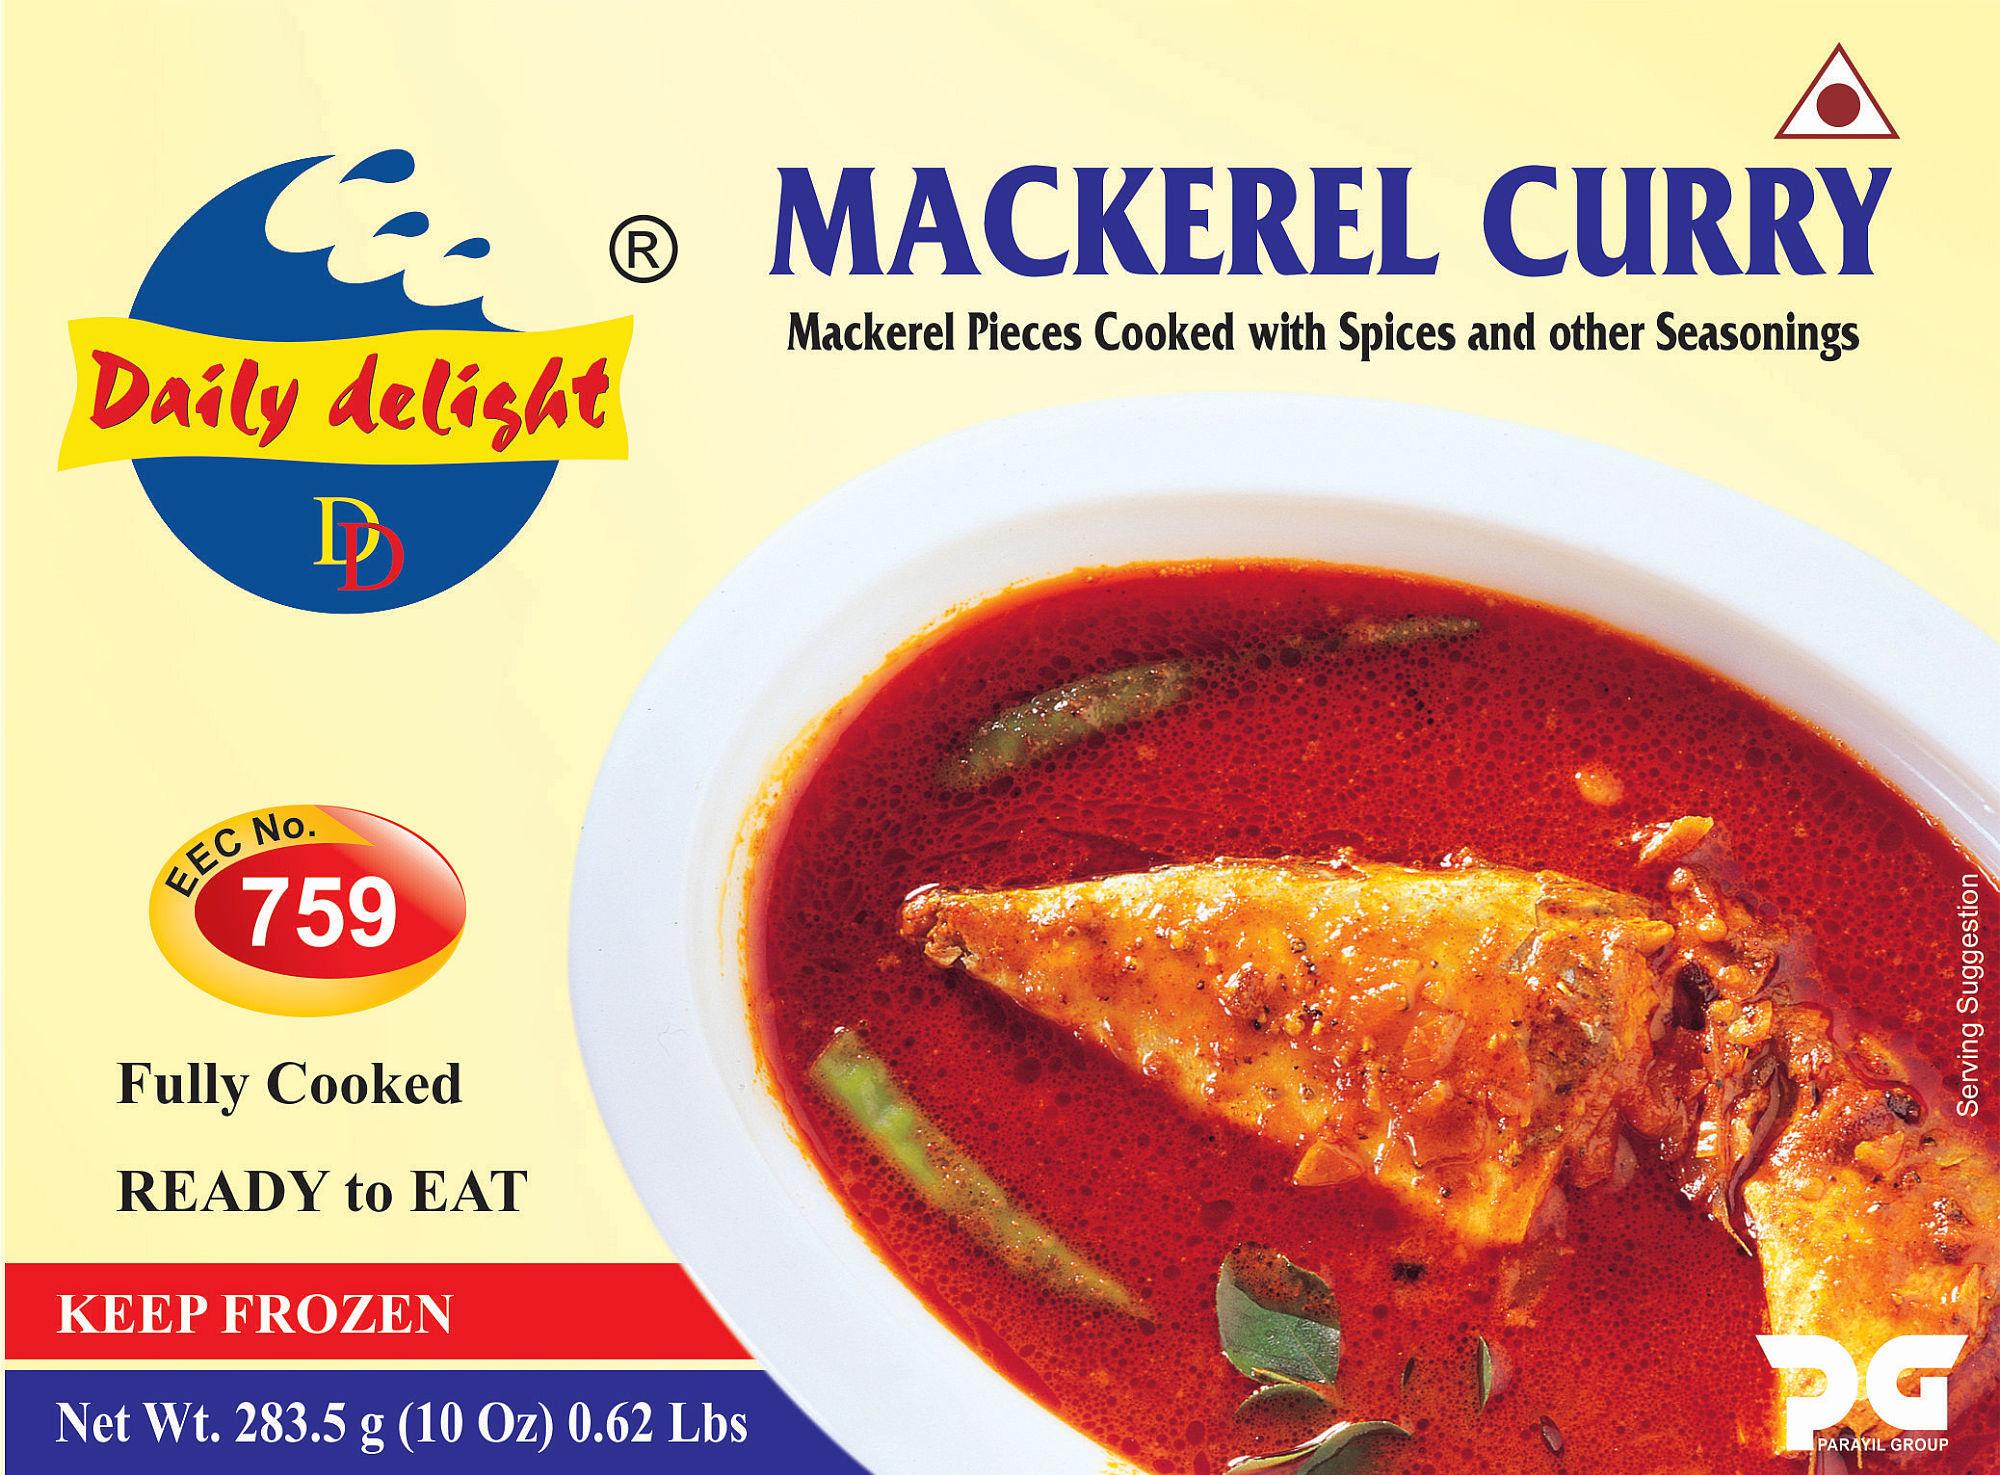 Daily Delight Mackerel Curry